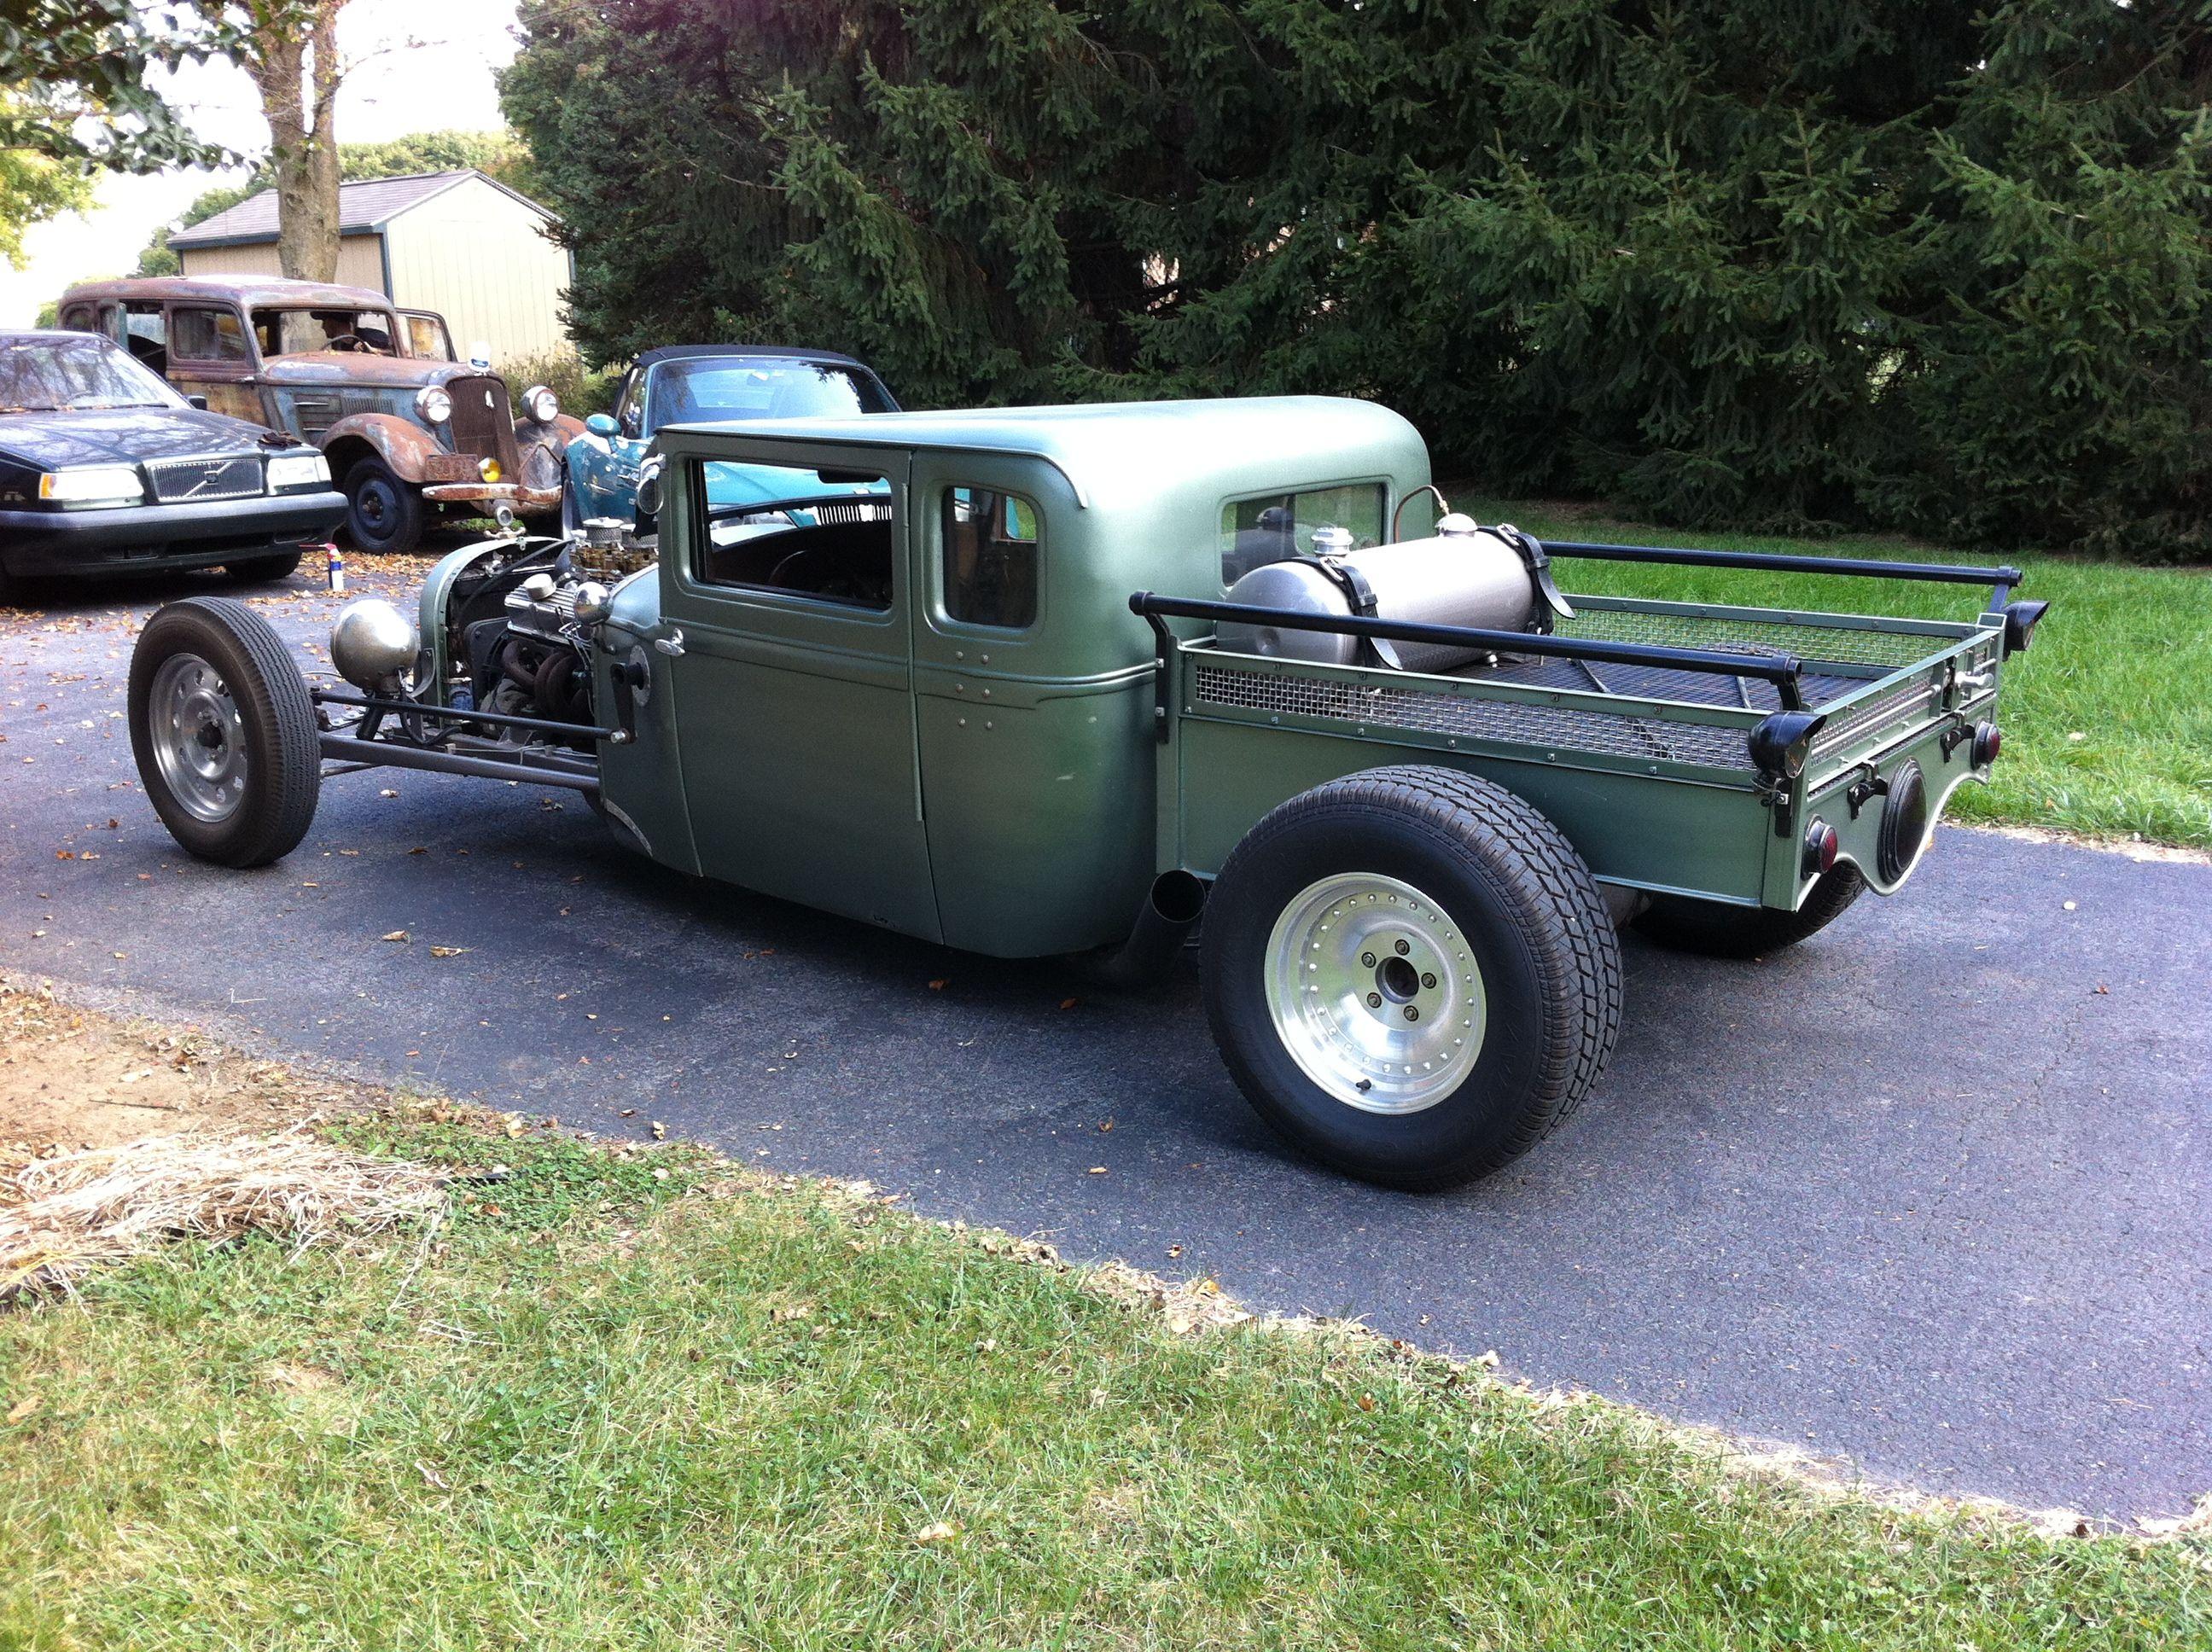 1928 Essex Rat Rod Built And Owned By Bones Rat Rod Rat Rod Build Monster Trucks